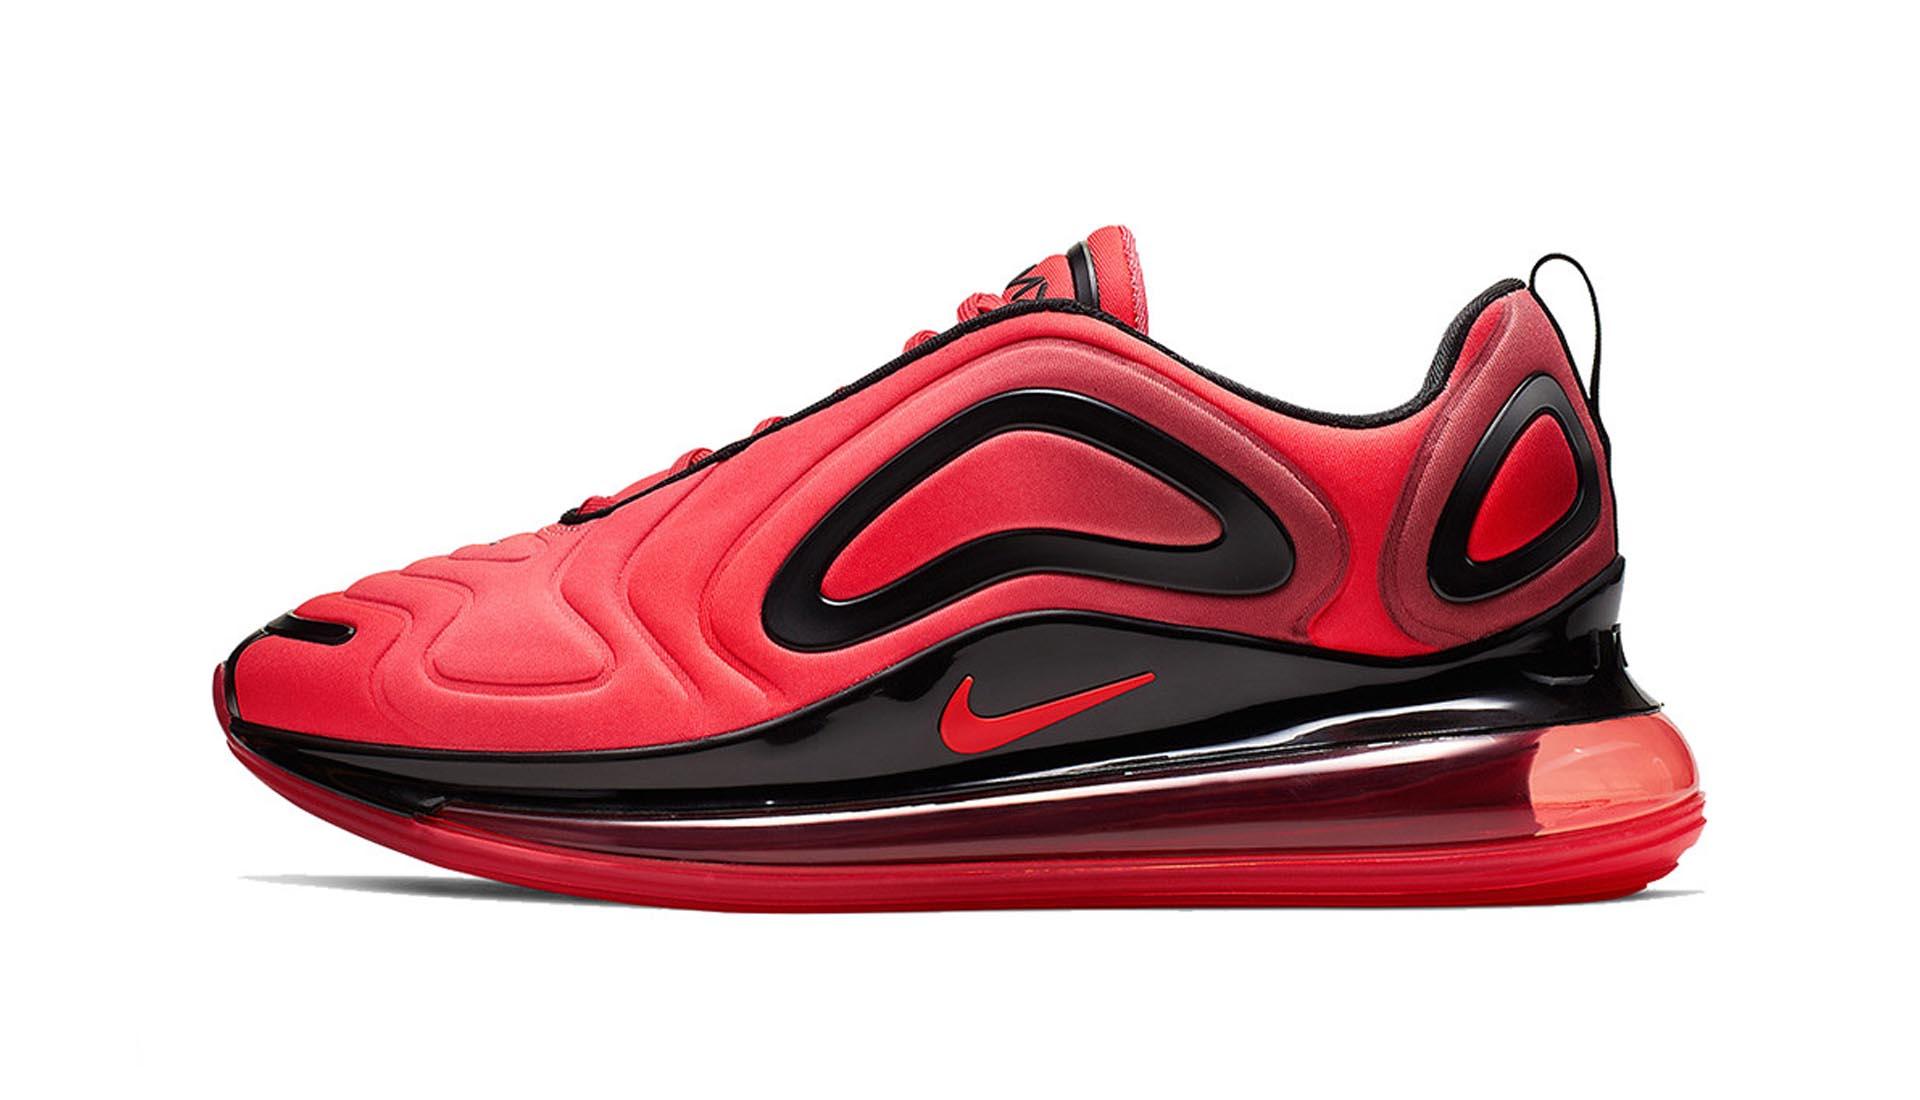 68409dcac268a Nike Air Max 720 Gets A